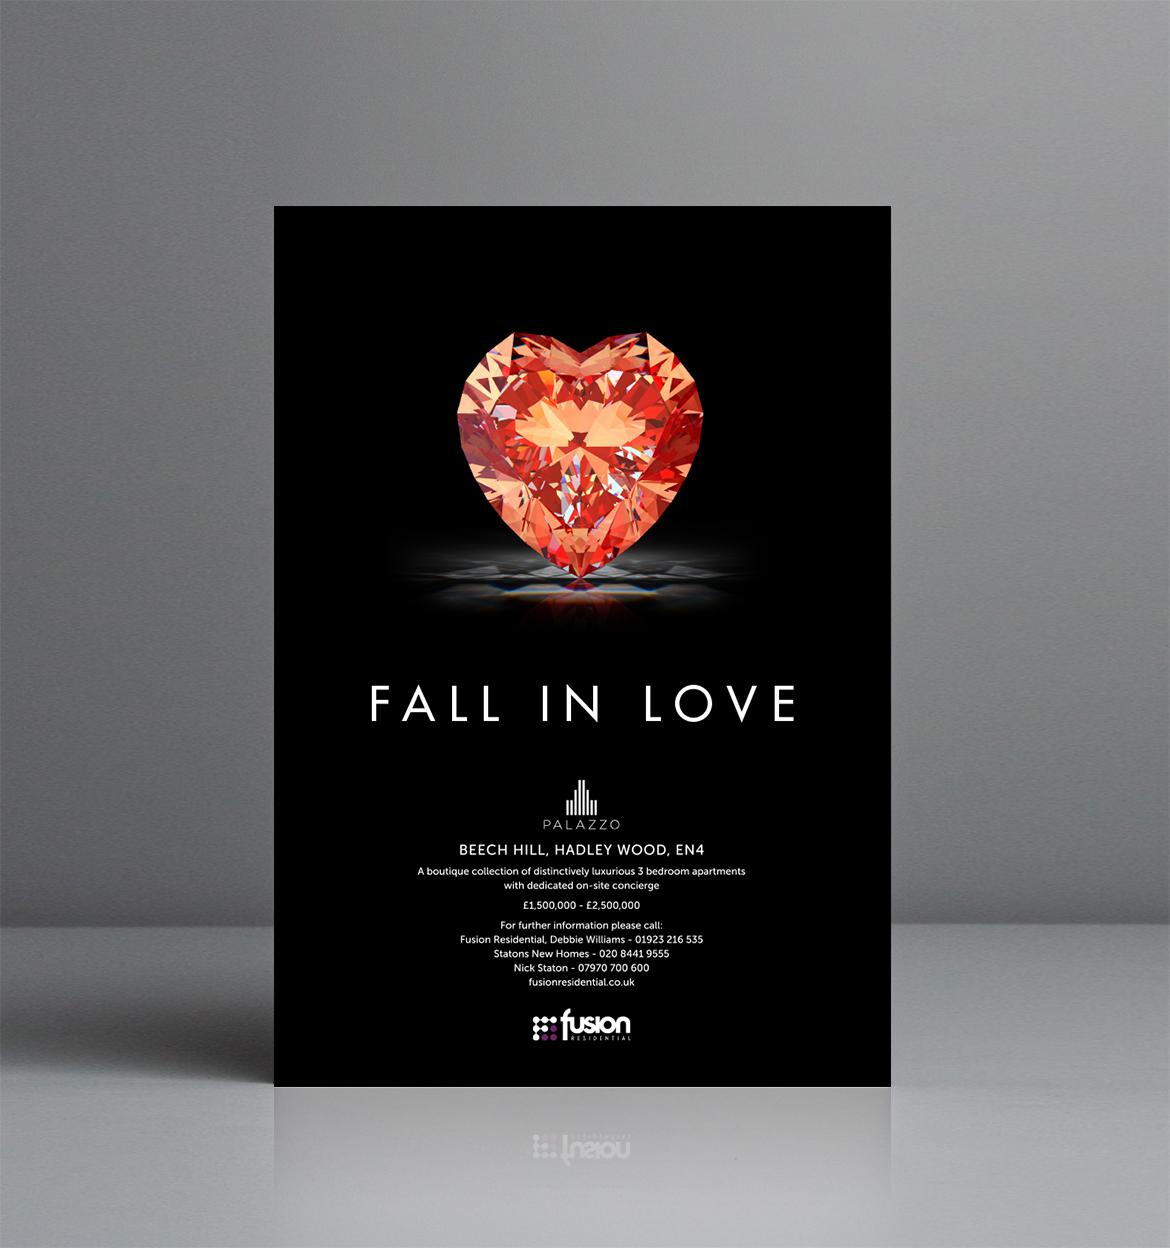 FallinLove_aloneposter copy